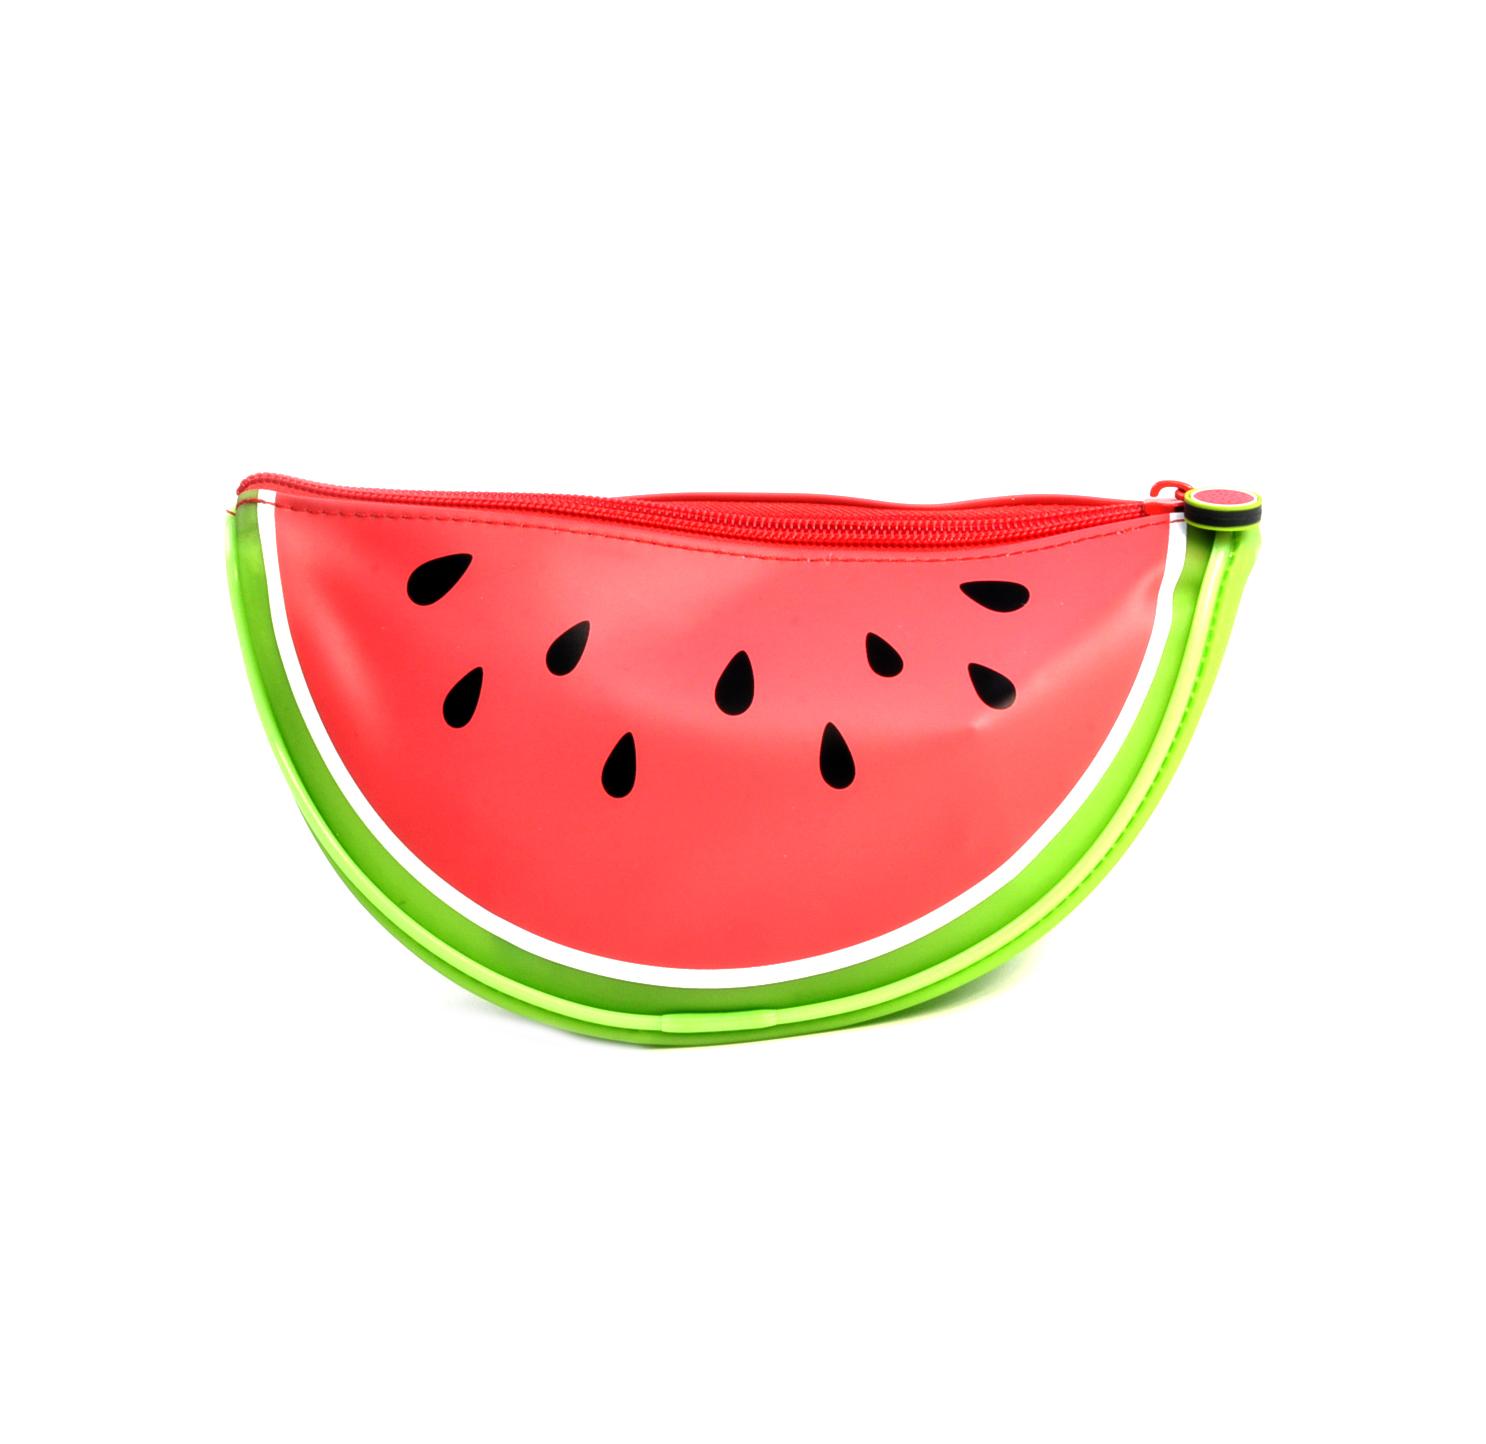 a7dfeba64042 Details about Ripe Watermelon Pencil Case / Cosmetics Bag